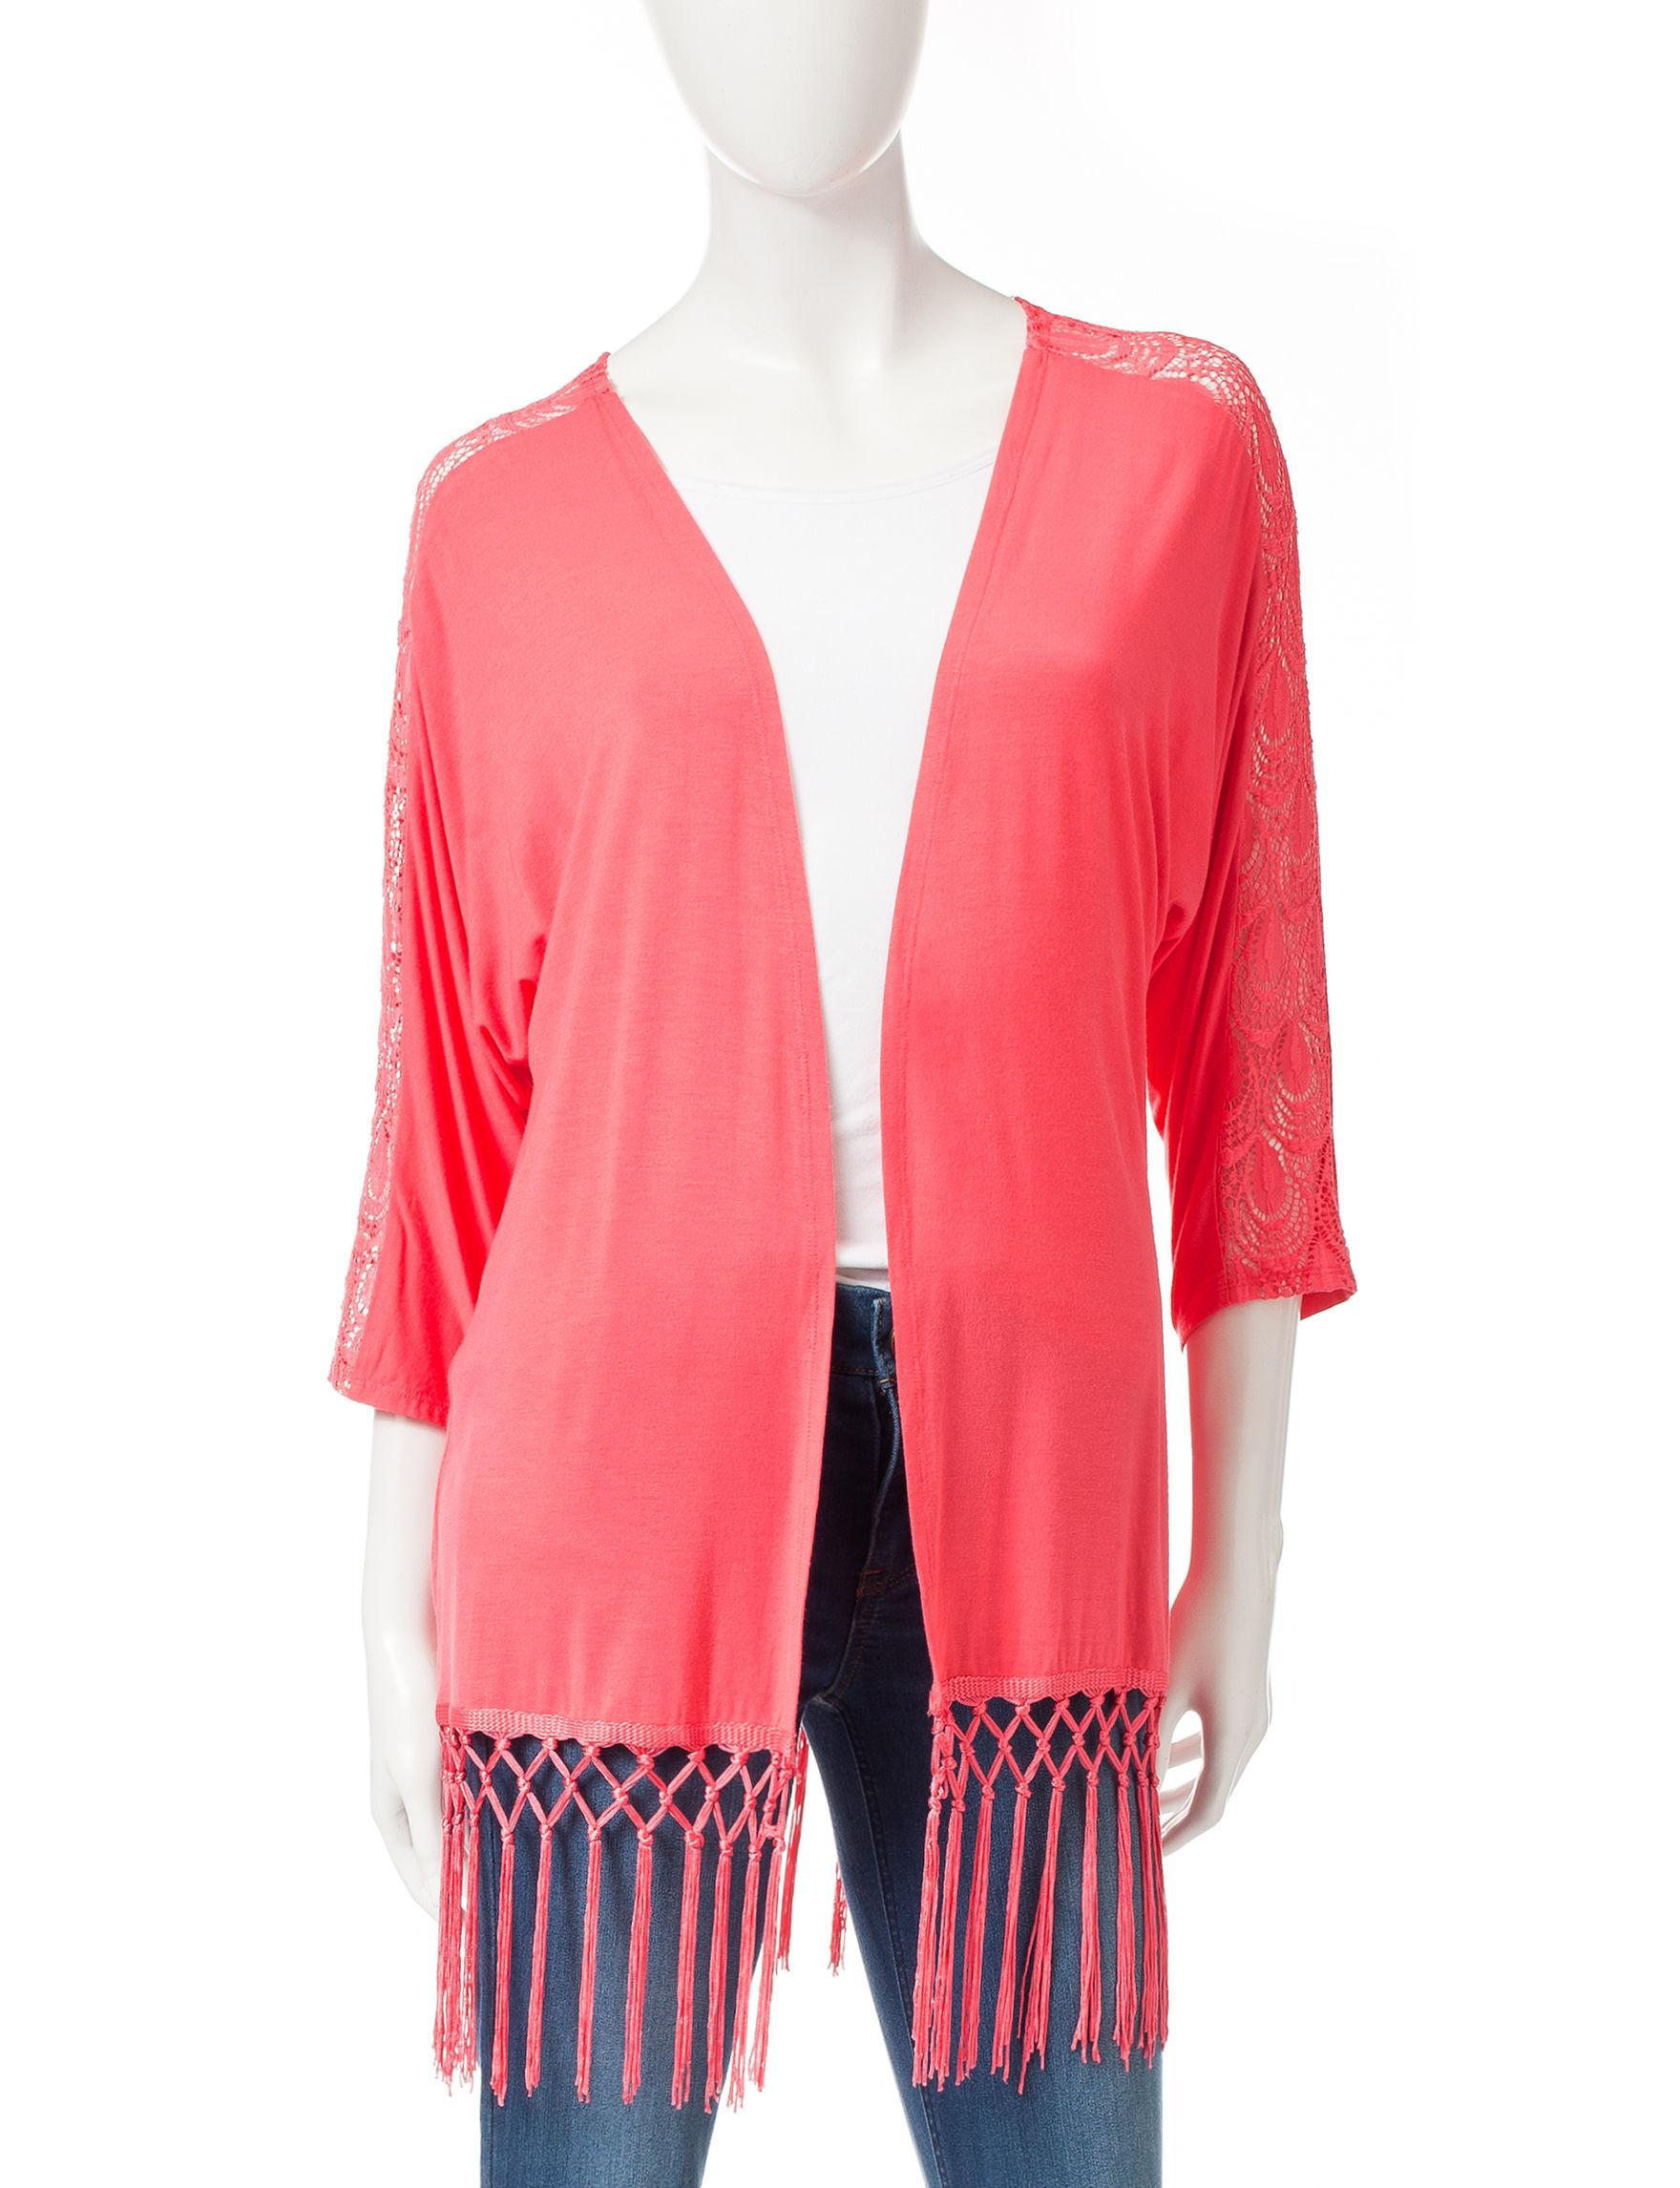 Pout Coral Shirts & Blouses